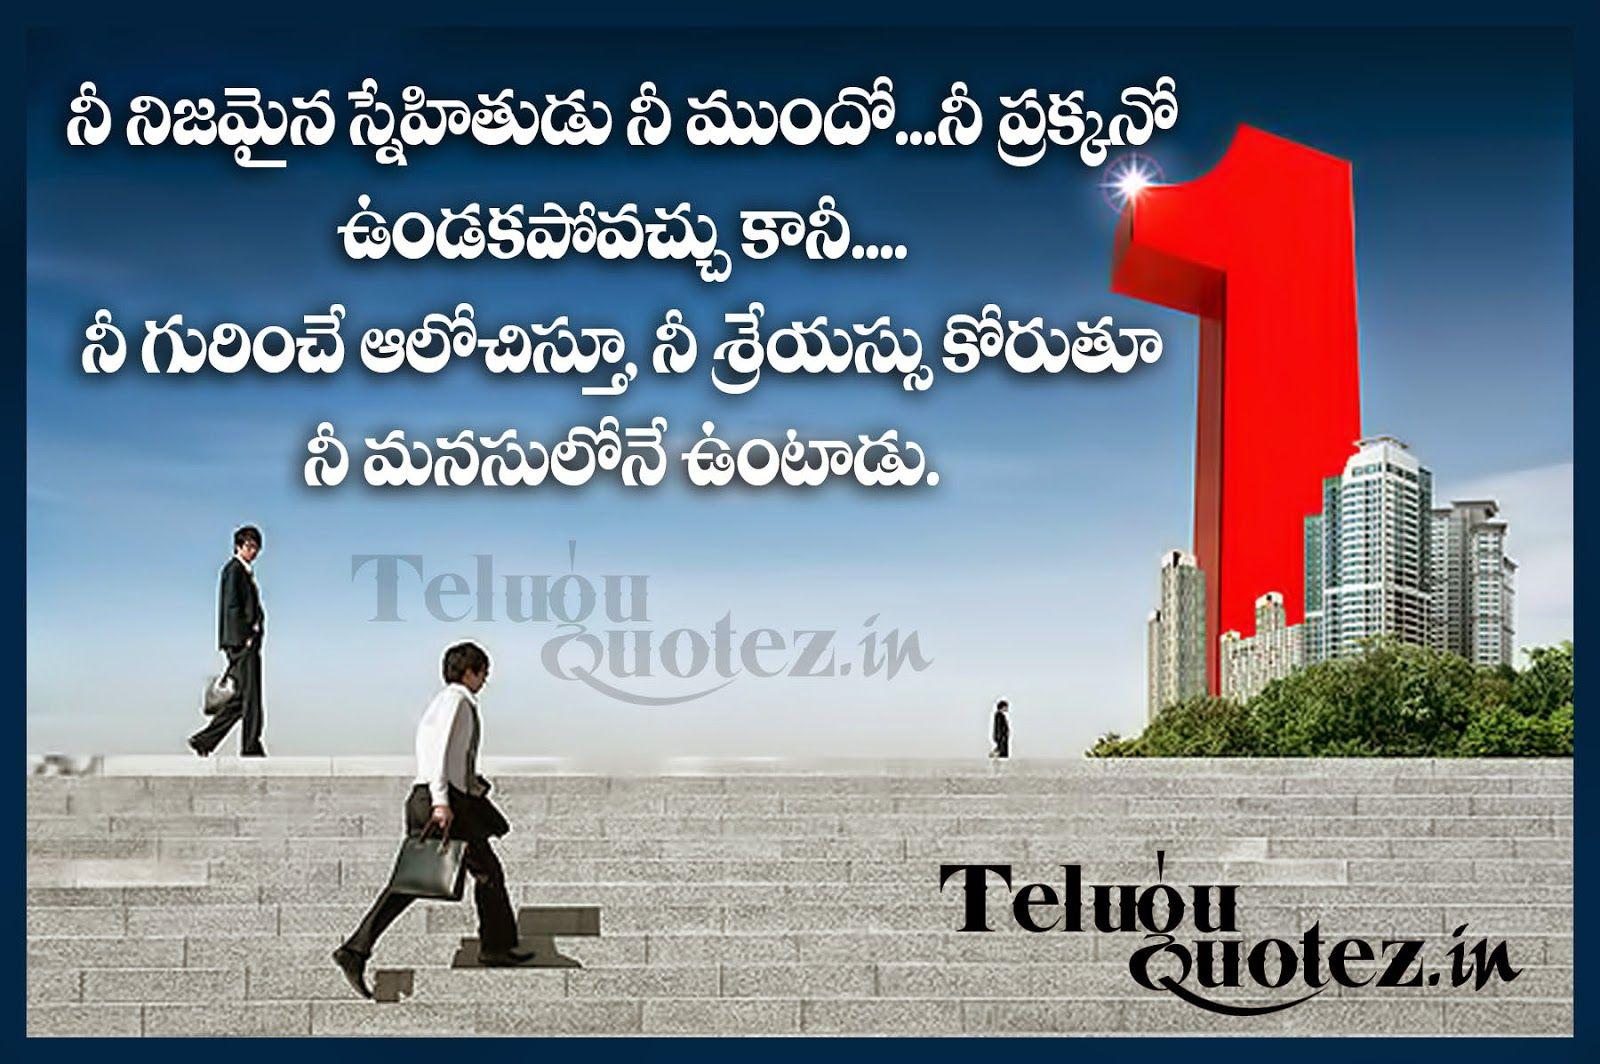 Teluguquotez In Telugu Quotes On Friendship Quotes Good Morning